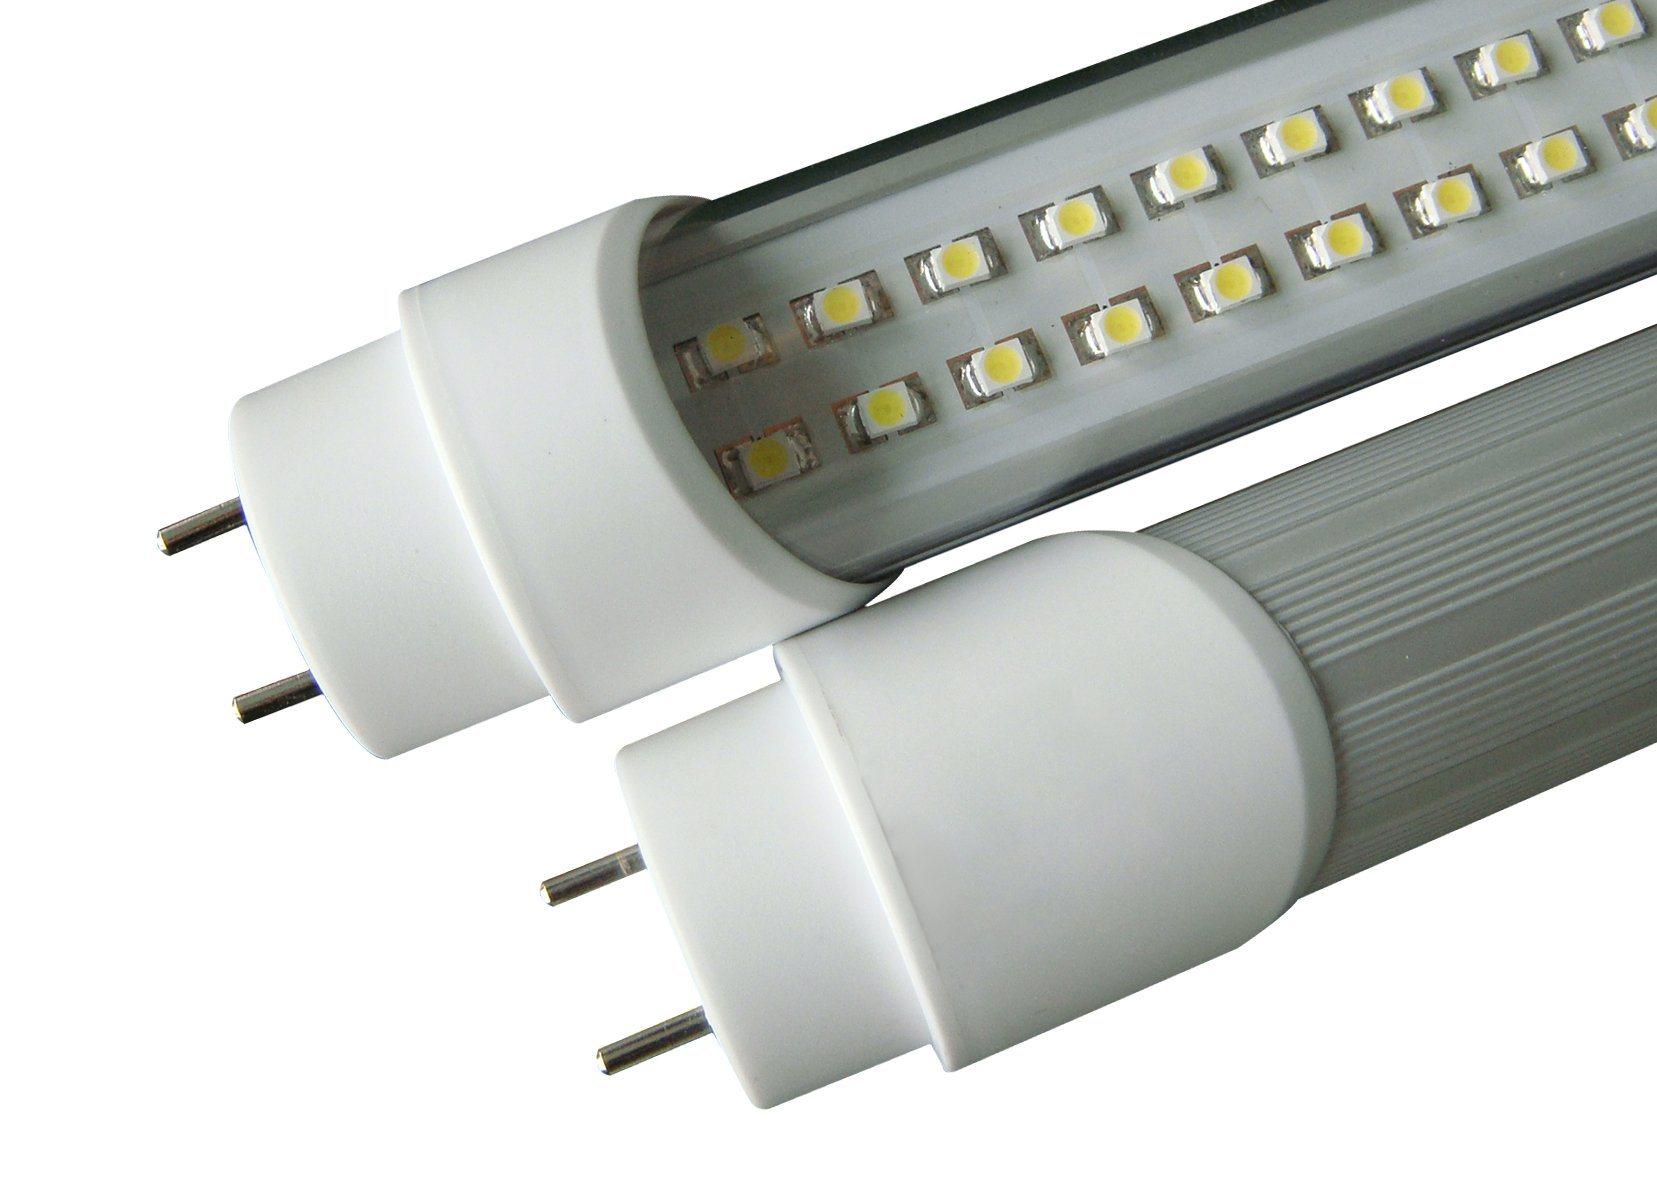 LED Tube 0.6m LED Light LED